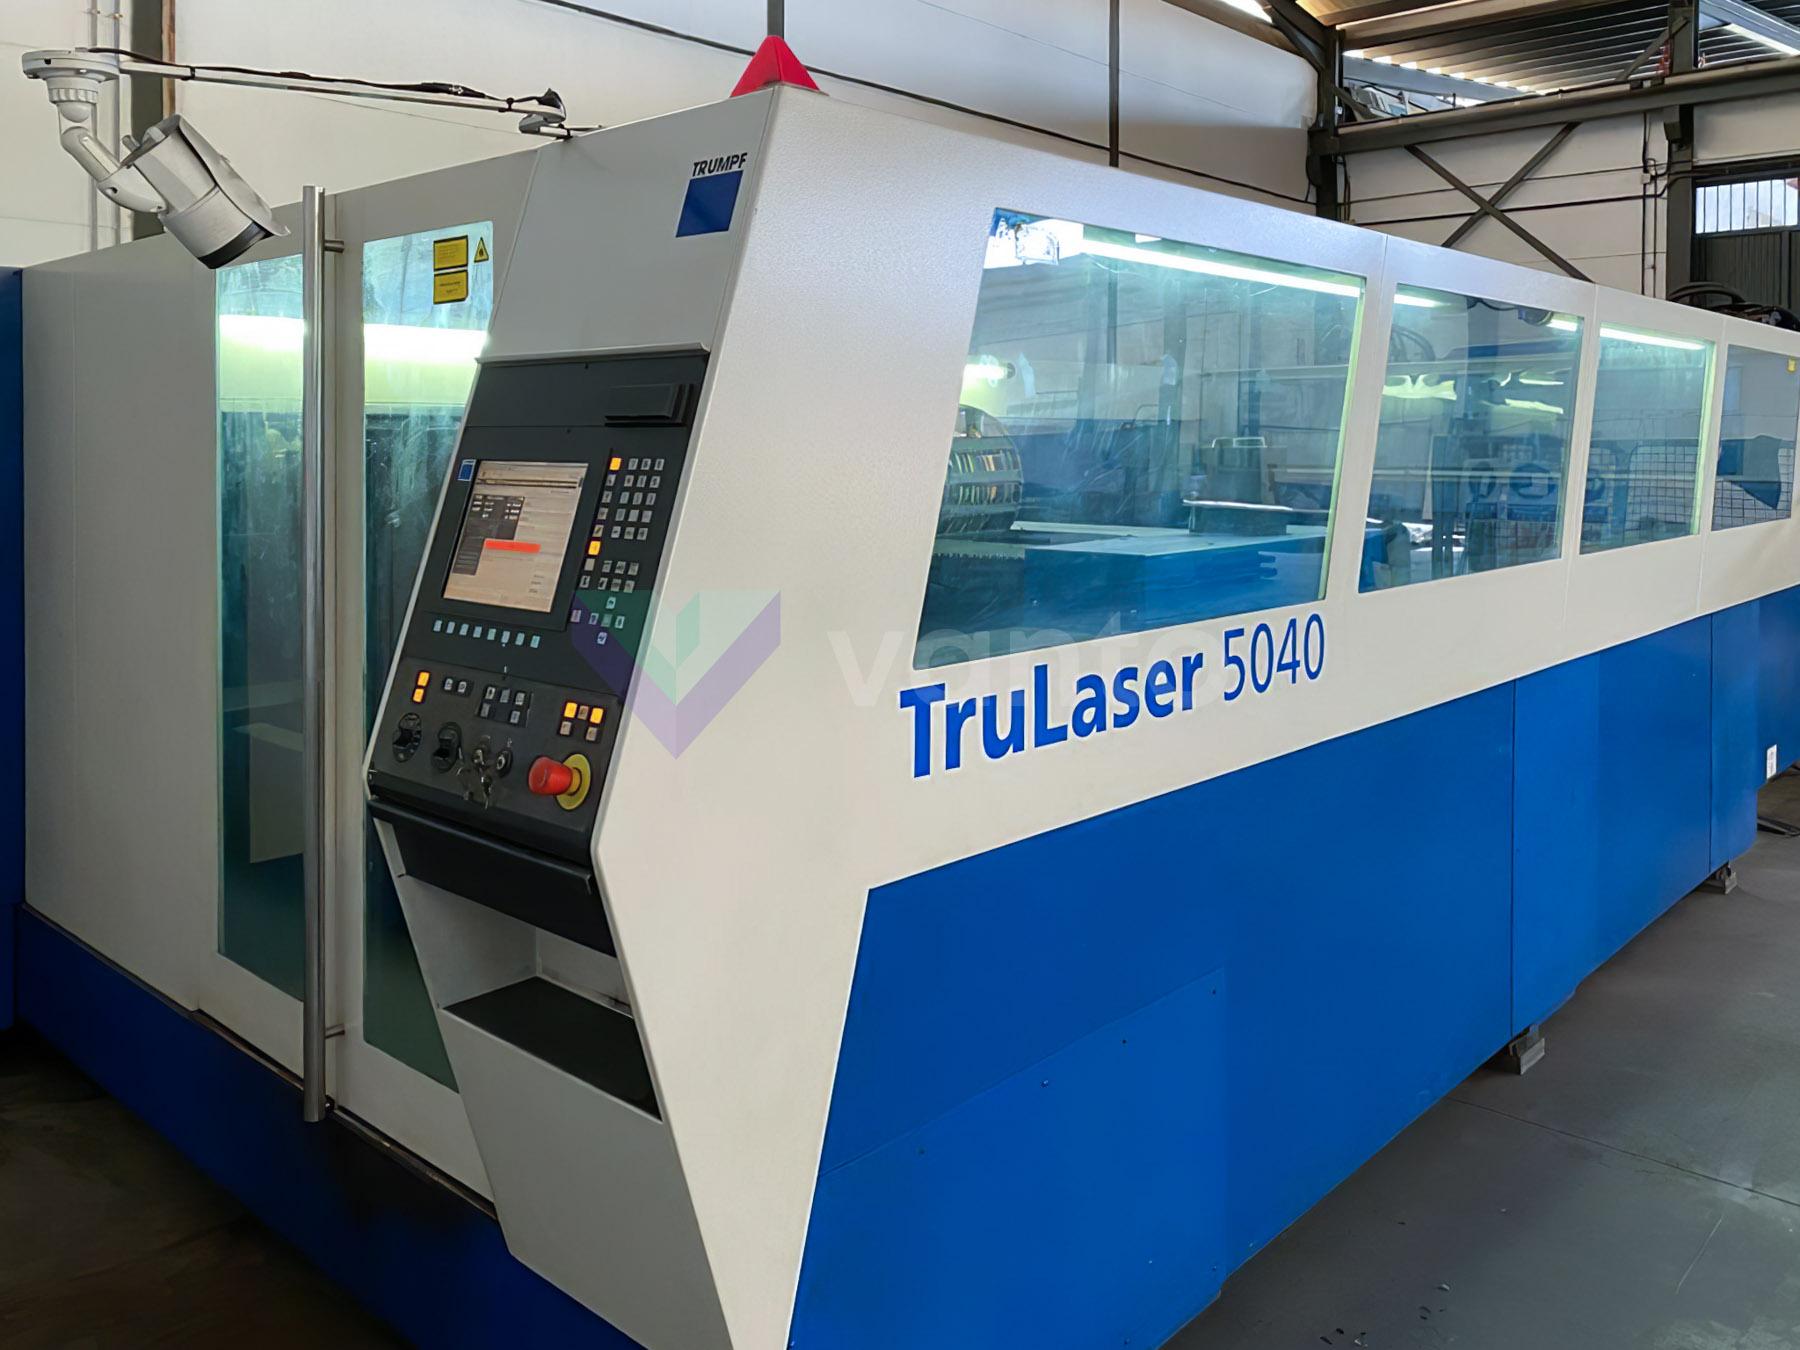 Lazer kesme makinesi (CO2) TRUMPF TruLaser 5040 (2006) id10419